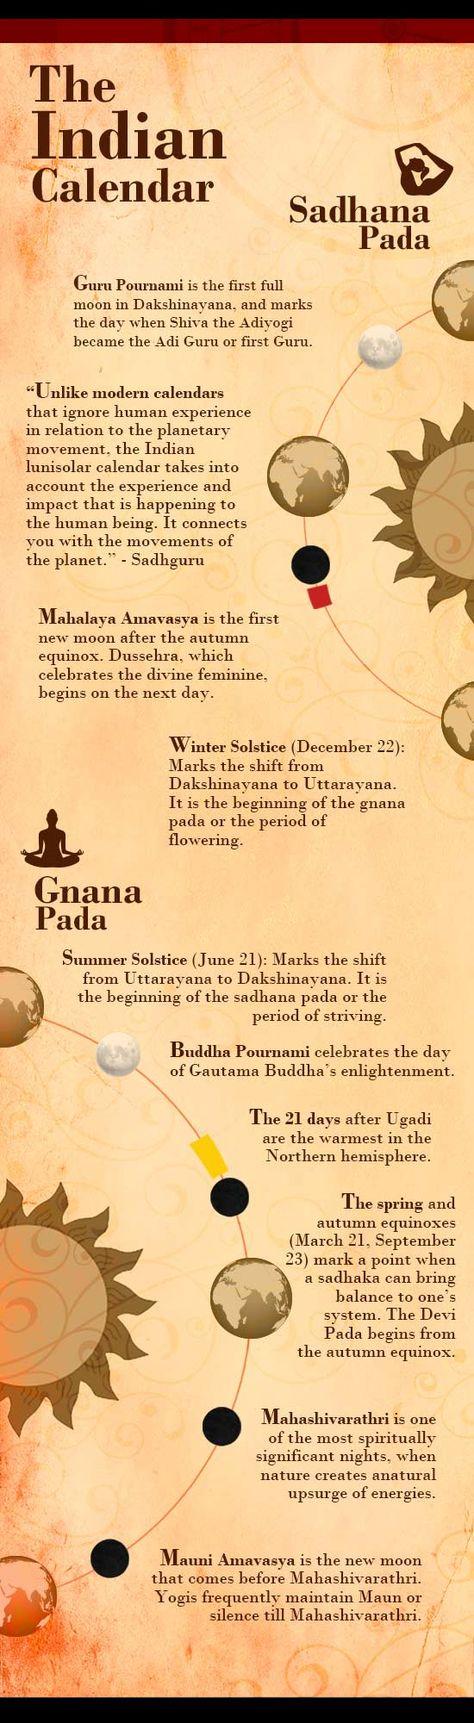 Best 20 indian festival calendar ideas on pinterest holi date elephants in india and happy holi